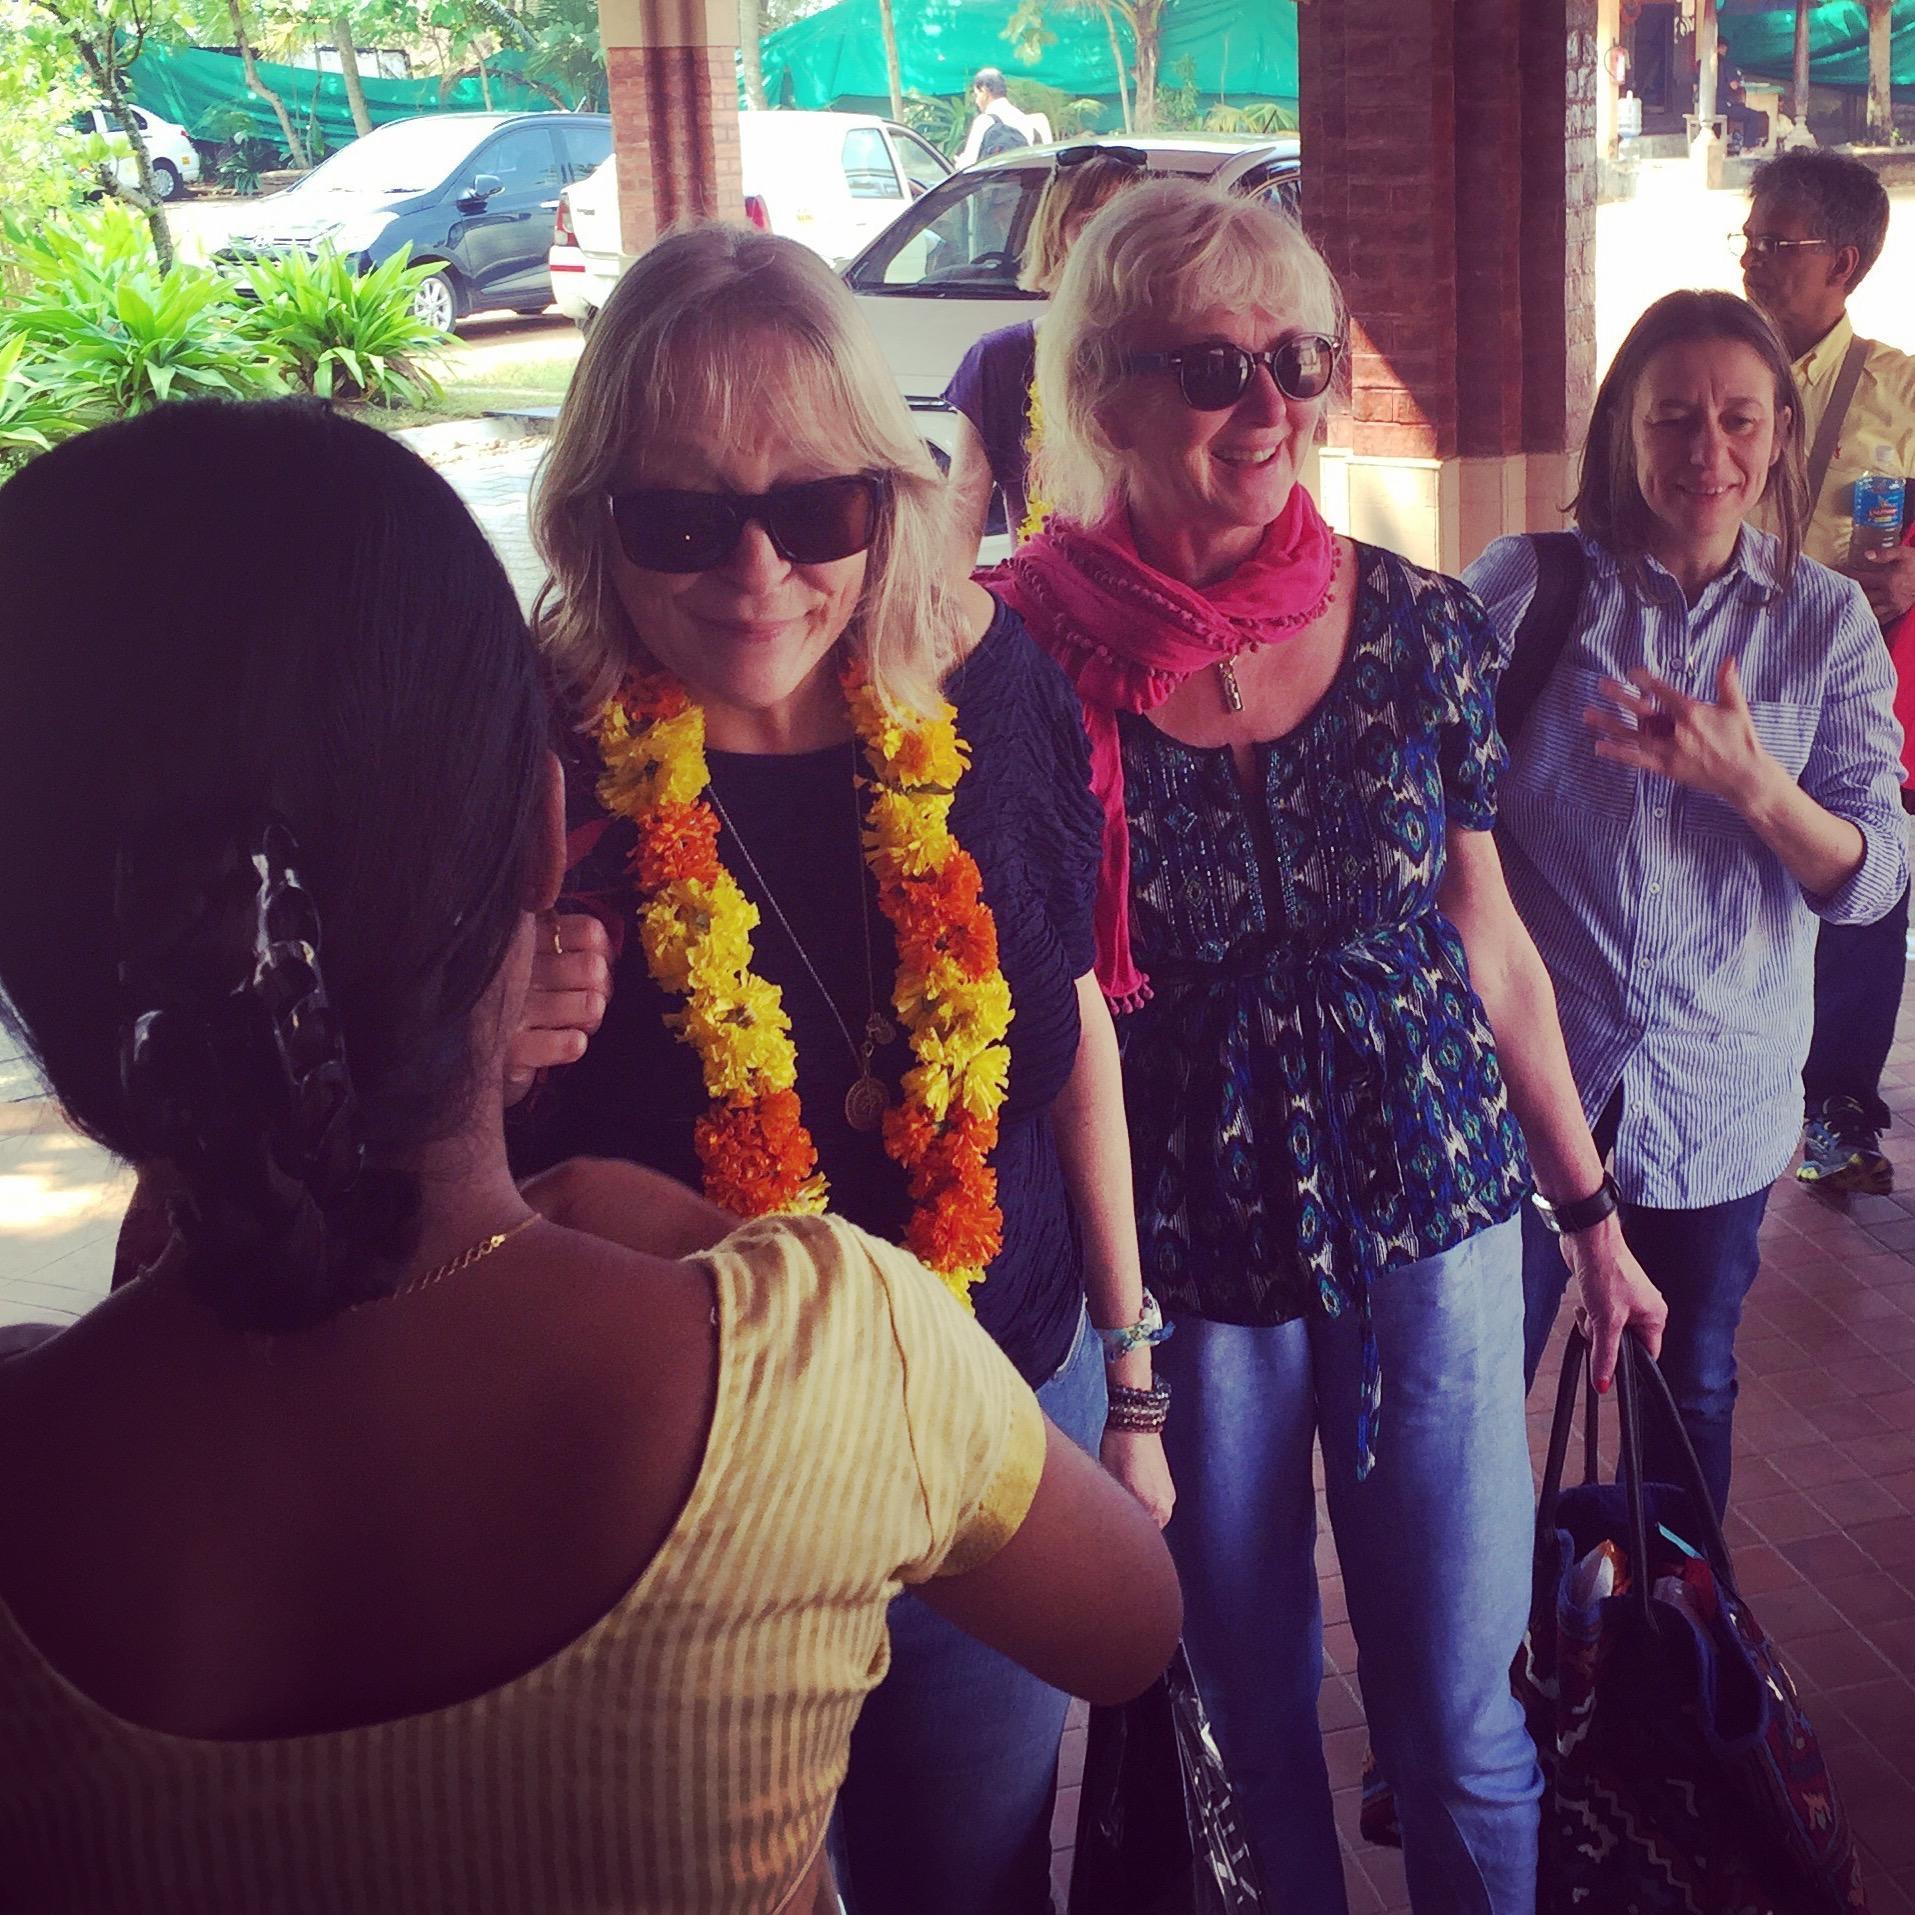 arrival, cherai, beach, resort, welcome, drink, garland, flowers, warm